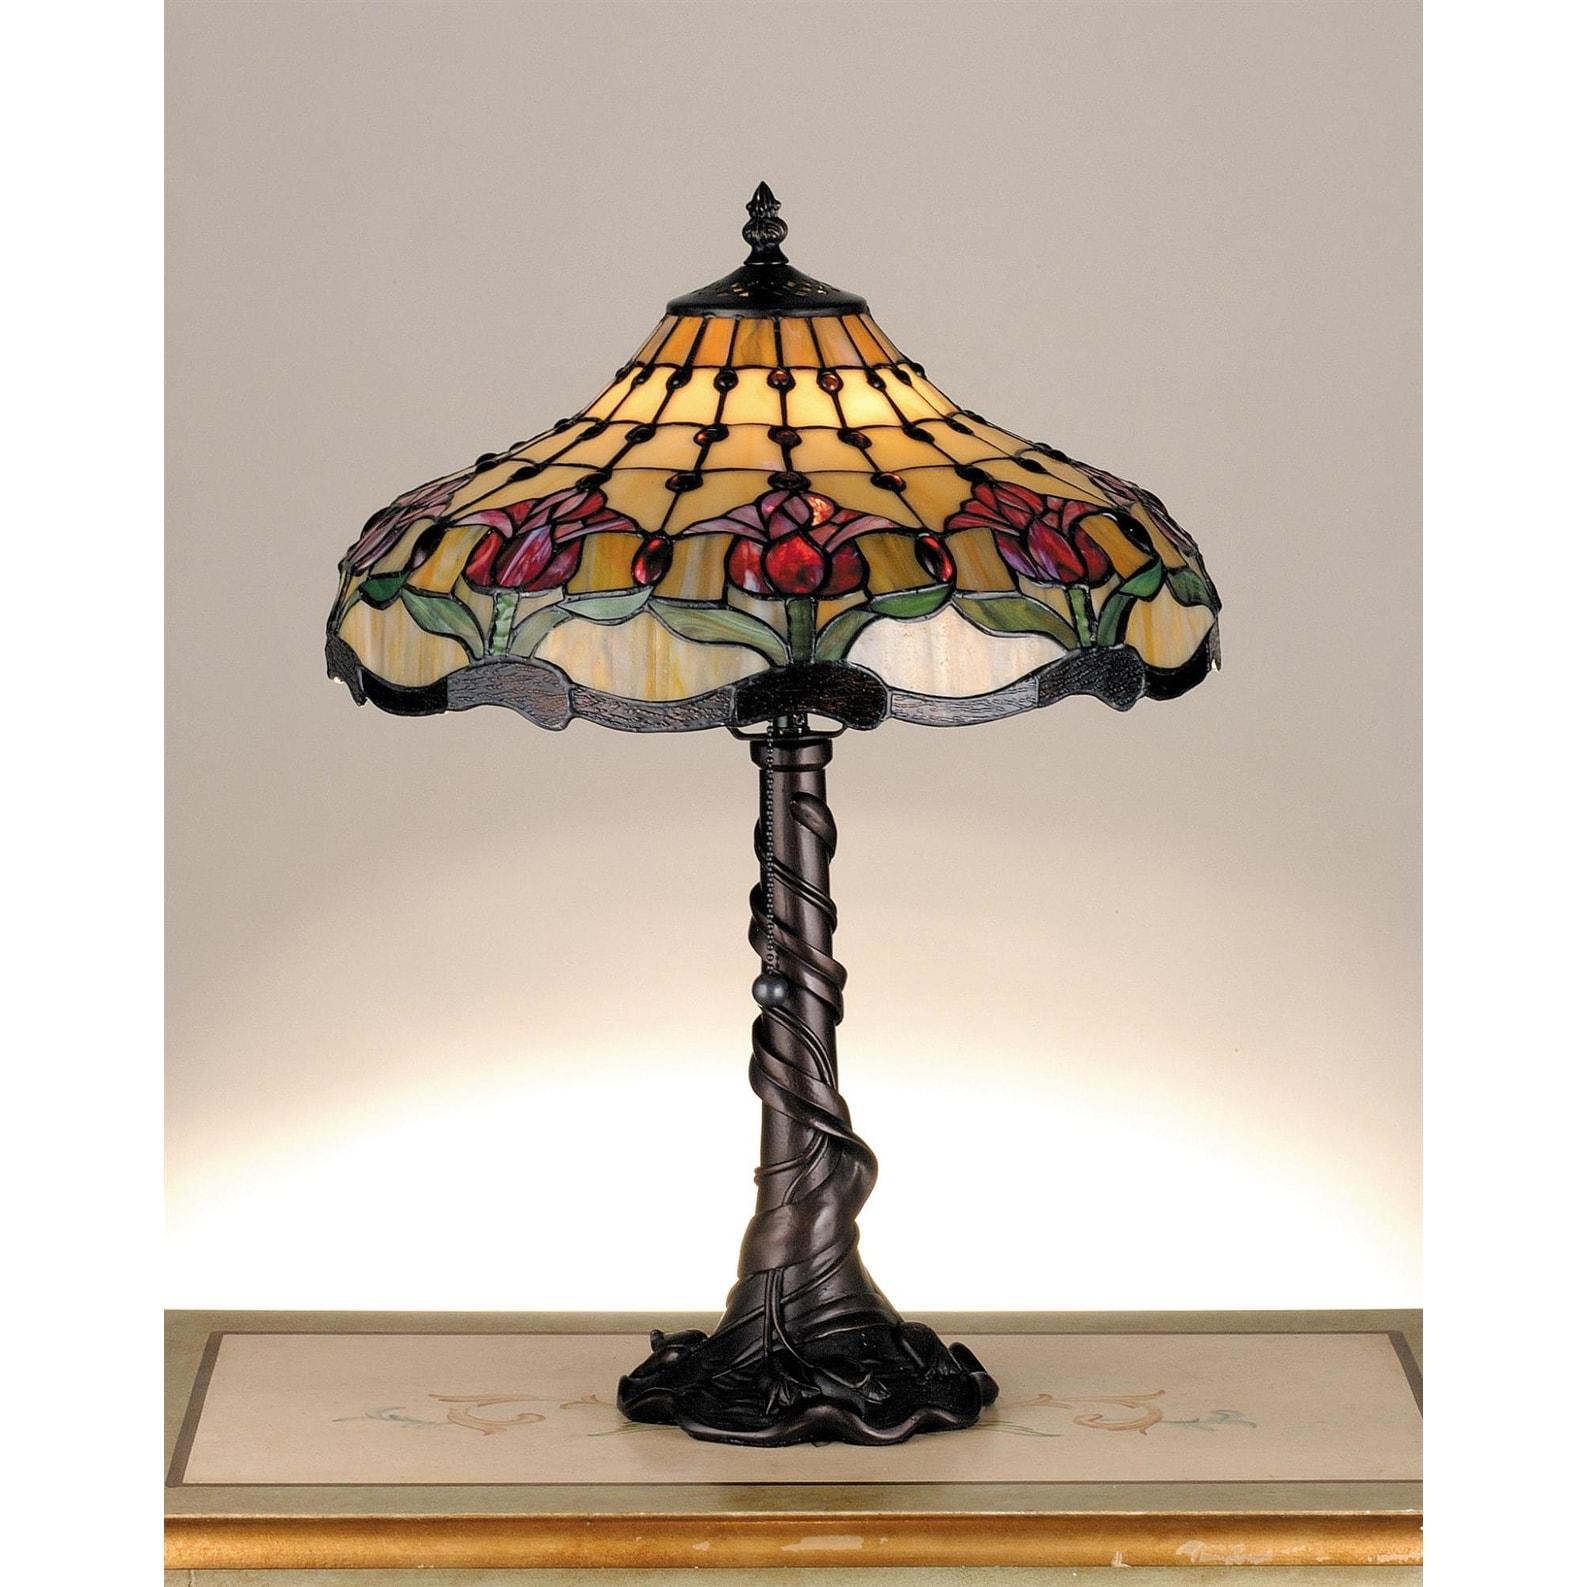 Shop Meyda Tiffany 1 Light Table Lamp With Tiffany Accent